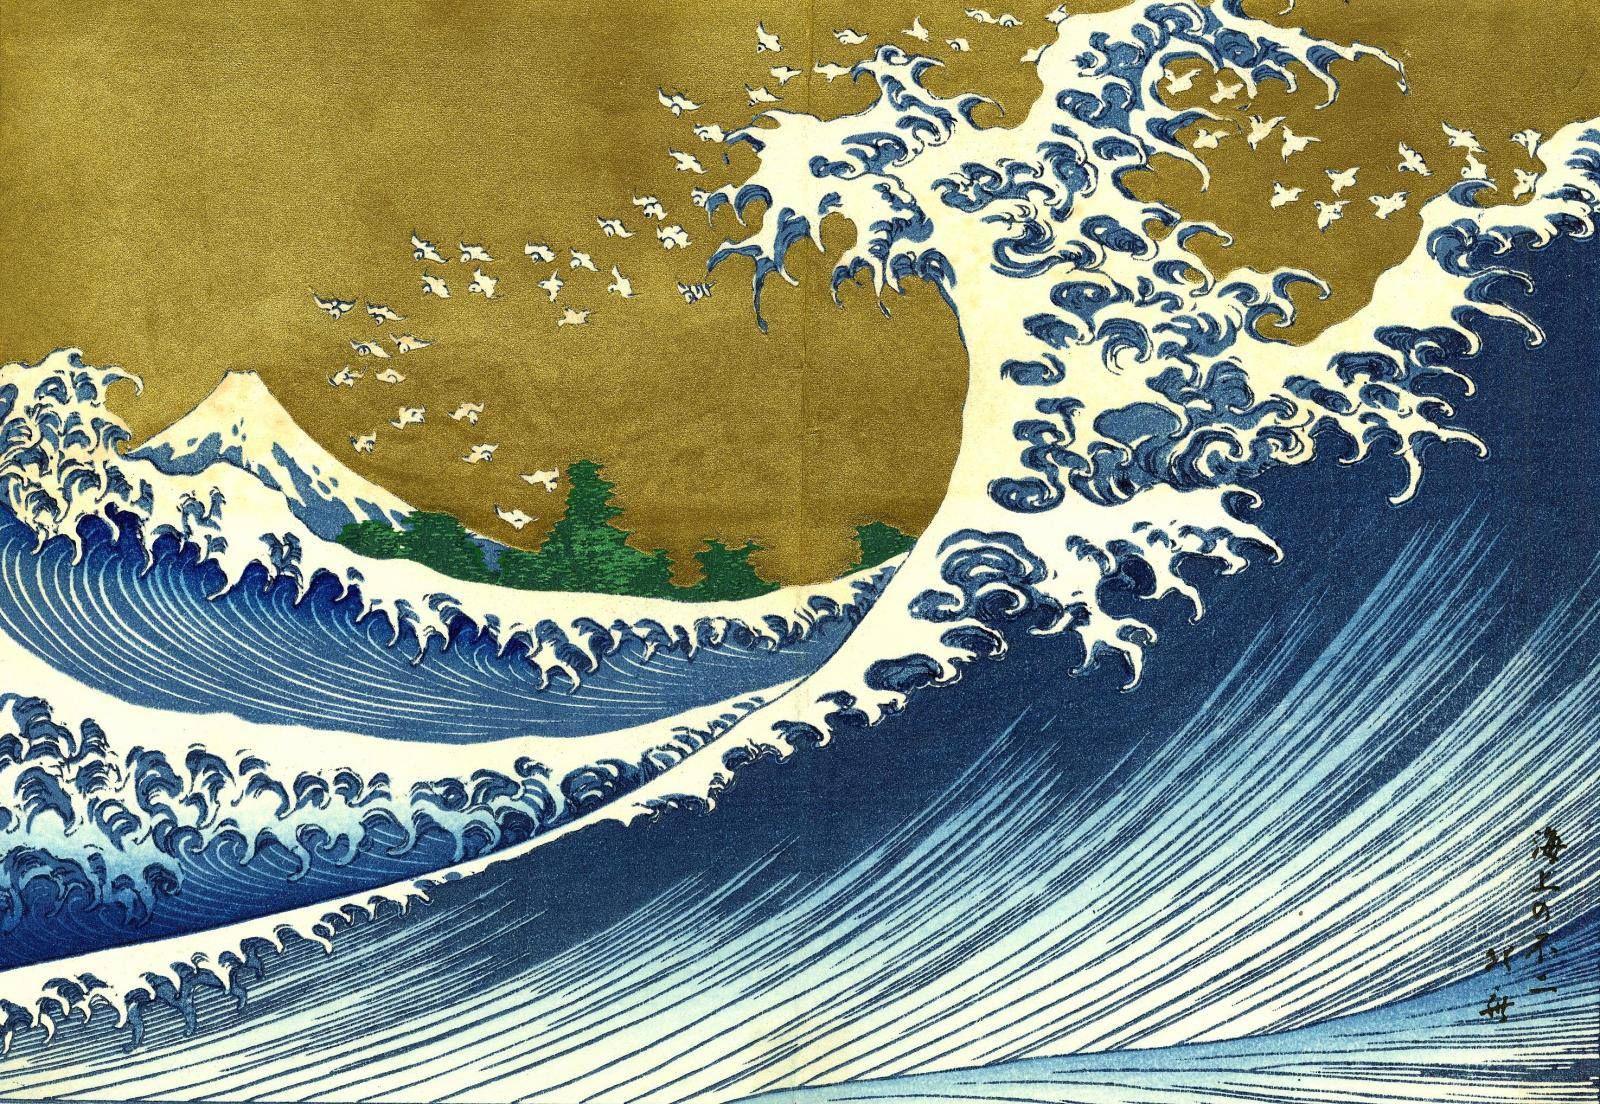 Hokusai Katsushika Japanese Ukiyo E 1760 1849 Fuji Seen From